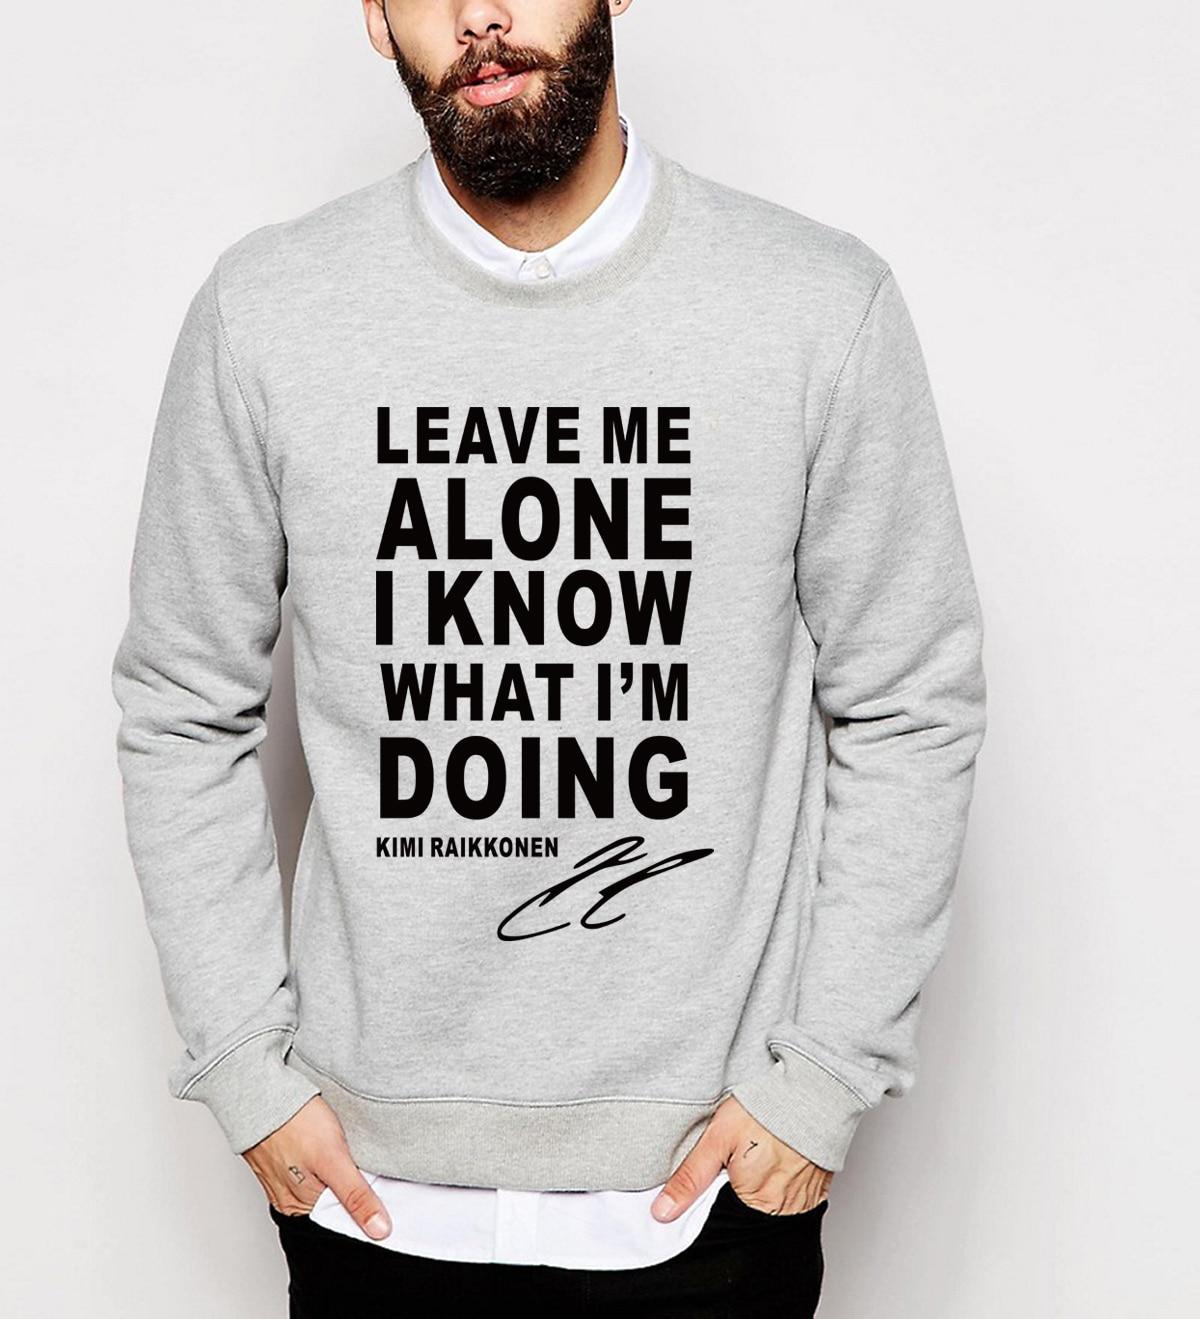 Pullover hip hop streetwear hoodies 2019 fall winter hipster men fitness tracksuit hot harajuku casual high quality sweatshirt